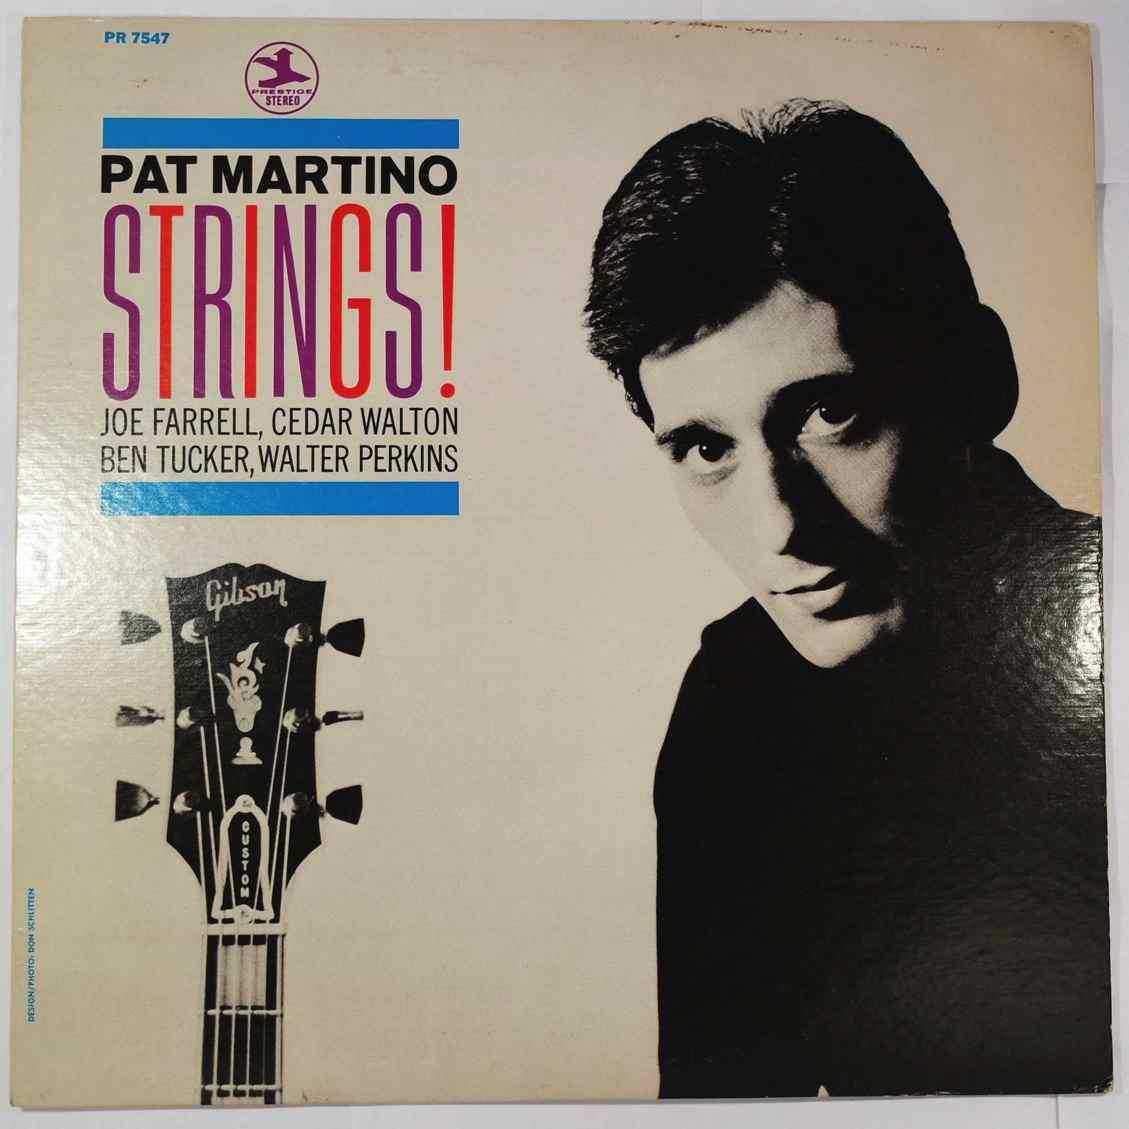 Pat Martino Strings!